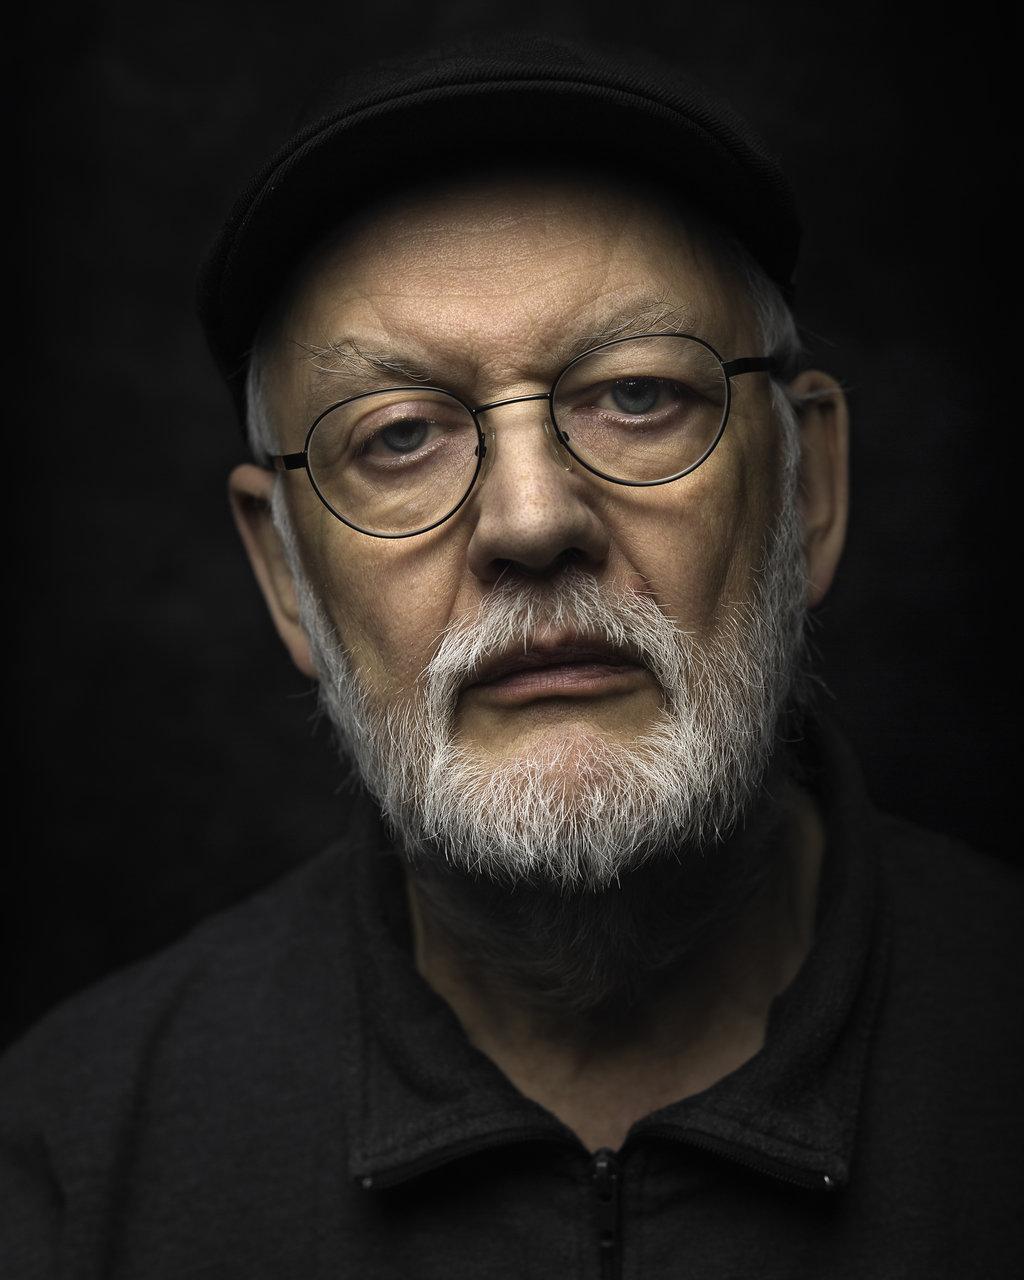 Herbert   Author Valentin Ivanov - valniuk   PHOTO FORUM